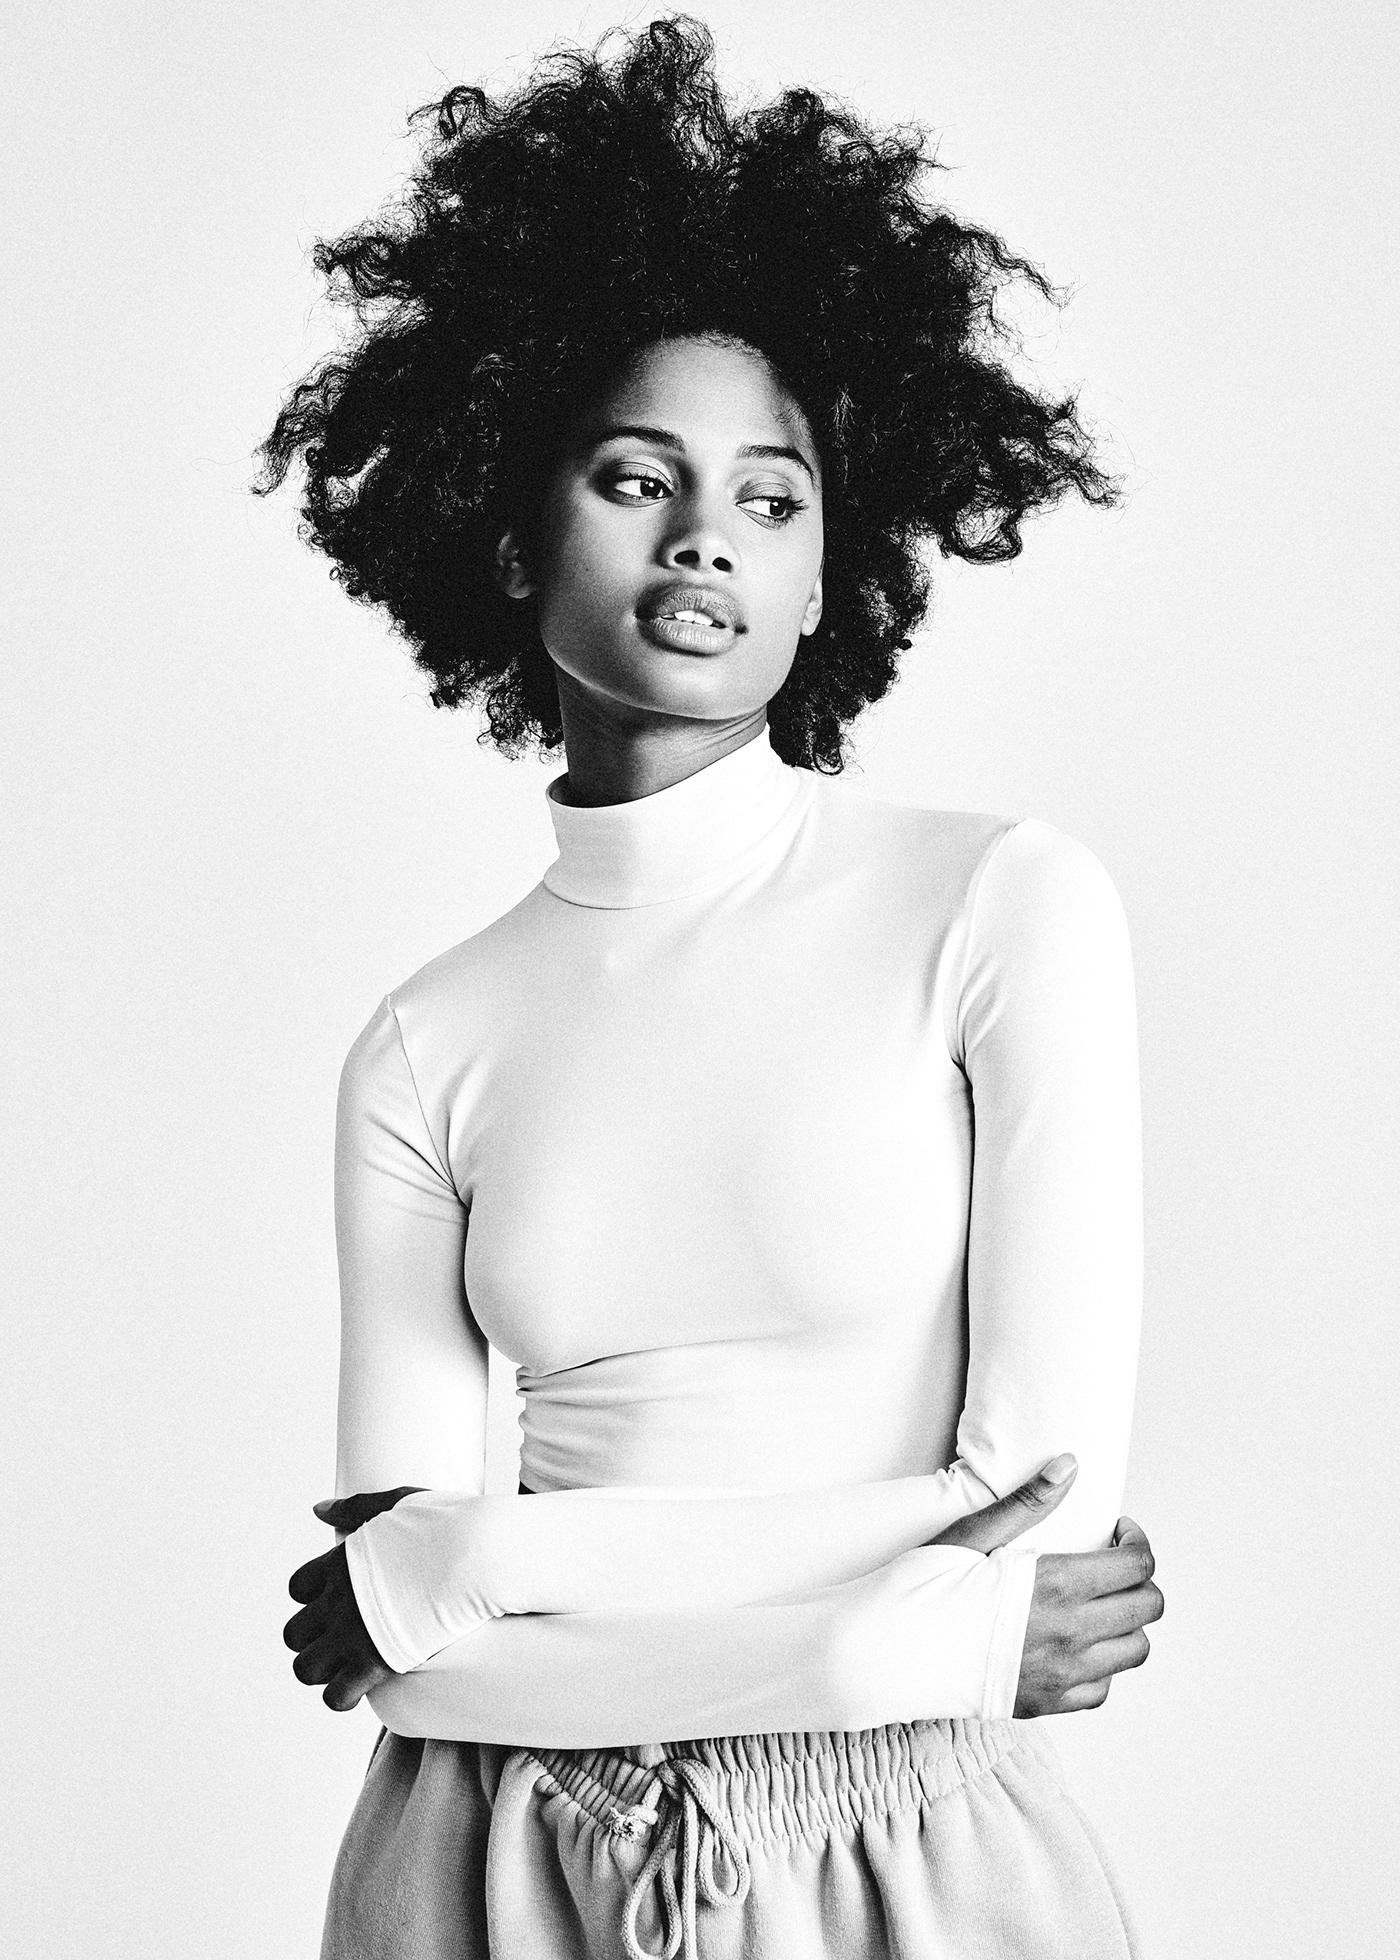 afro afrohair b&w black and white fashion portrait portrait studio White